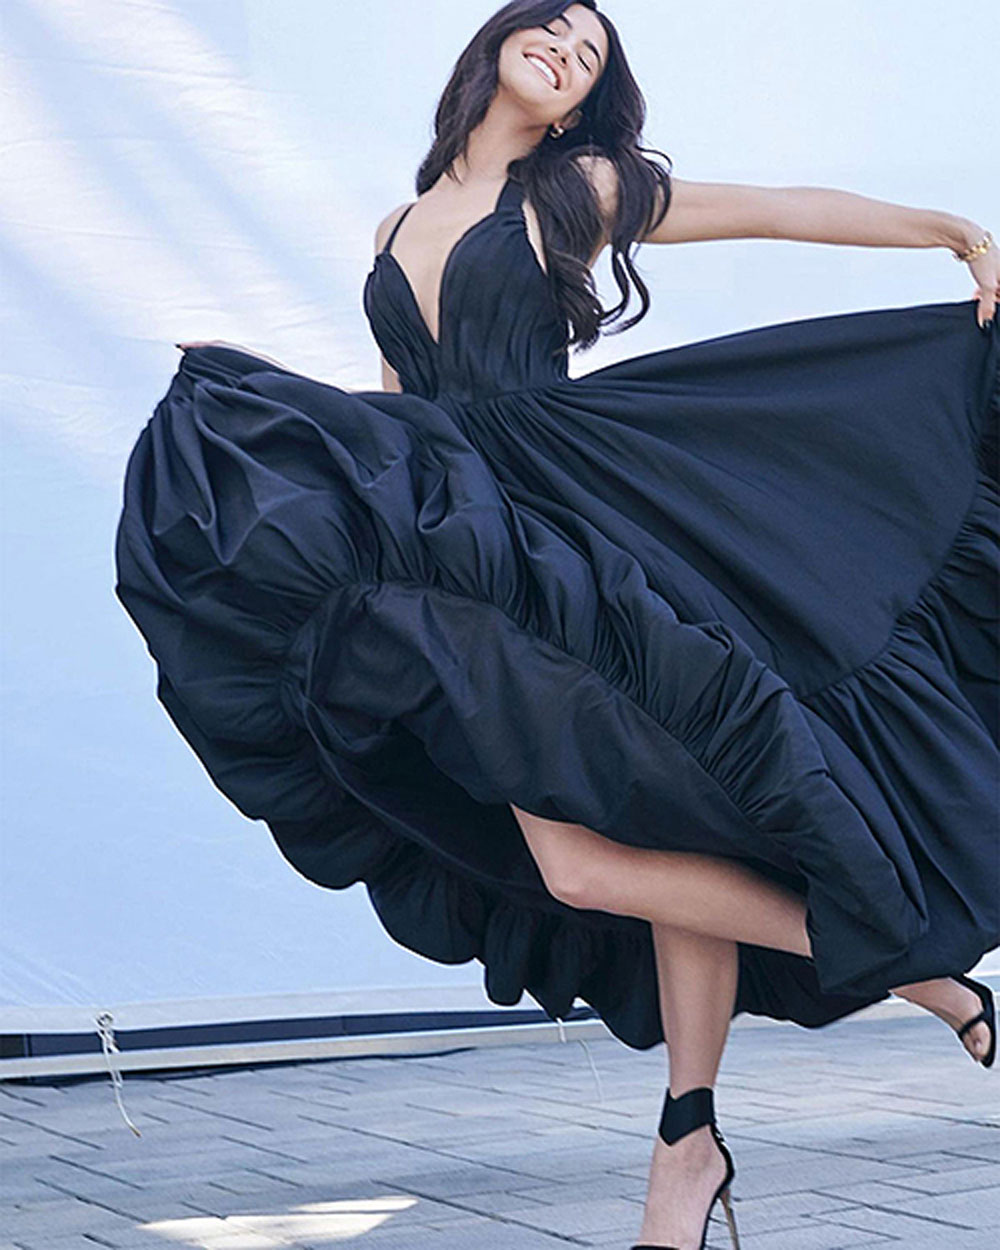 Queen of TikTok, Cong Tri dress, Charli D'Amelio, TikTok user, V-cut dress,  Cong Tri's collection